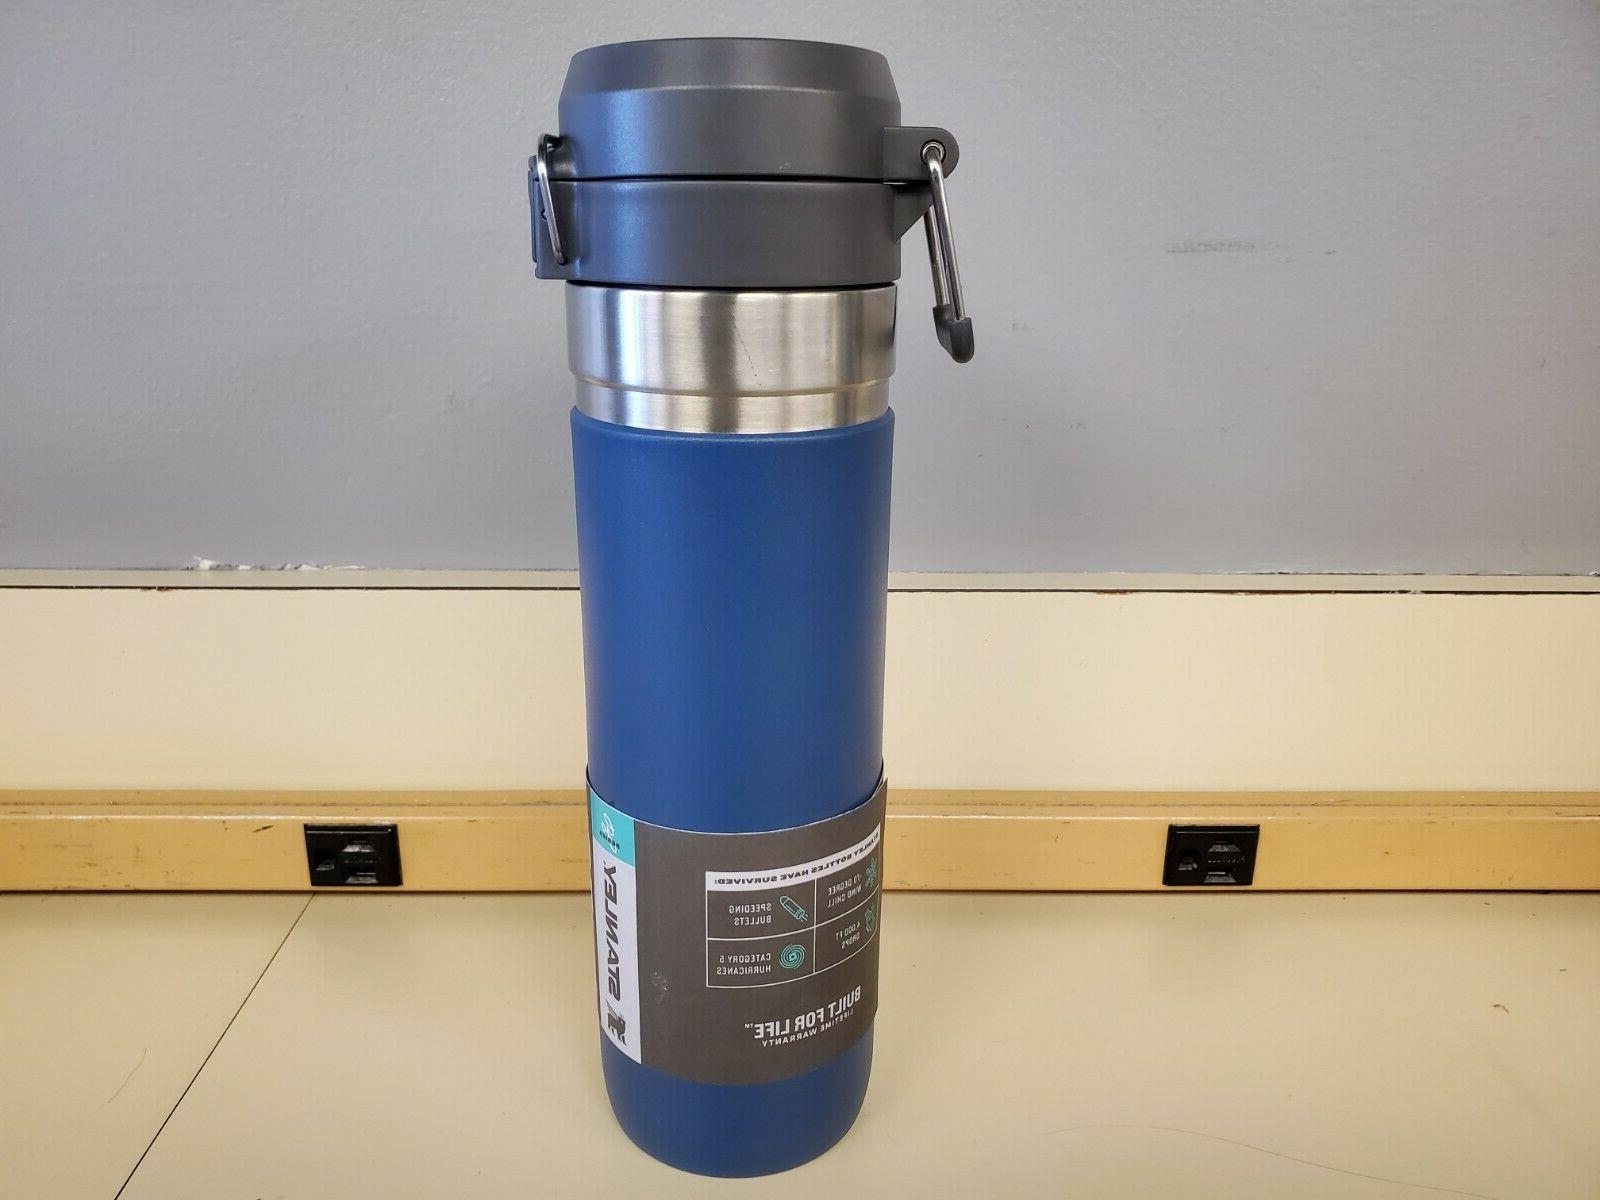 Stanley 24 oz. Quick Flip Vacuum Bottle